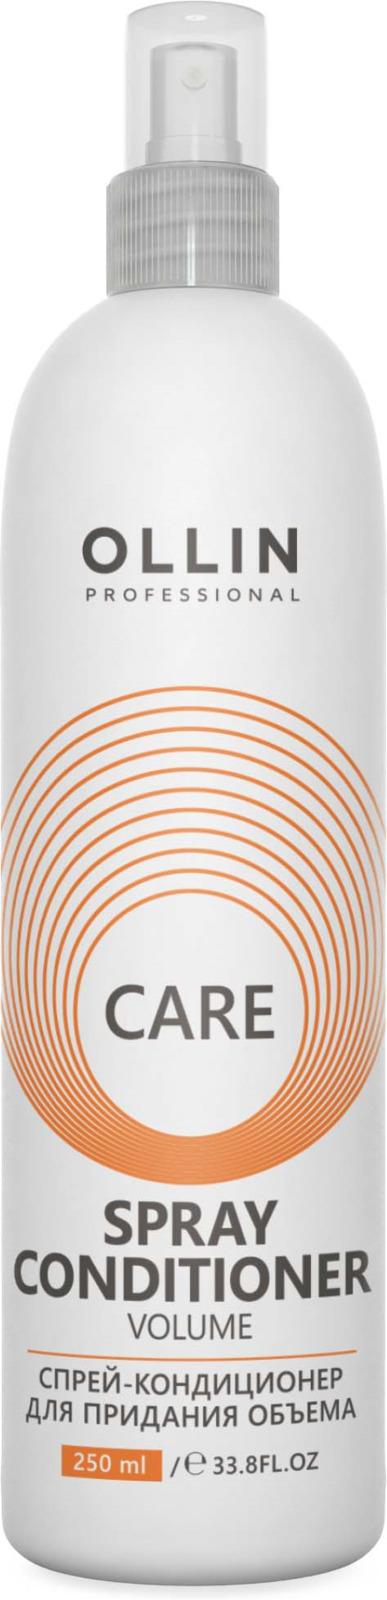 Ollin Спрей-кондиционер для придания объема Care Volume Spray Conditioner 250 мл цена